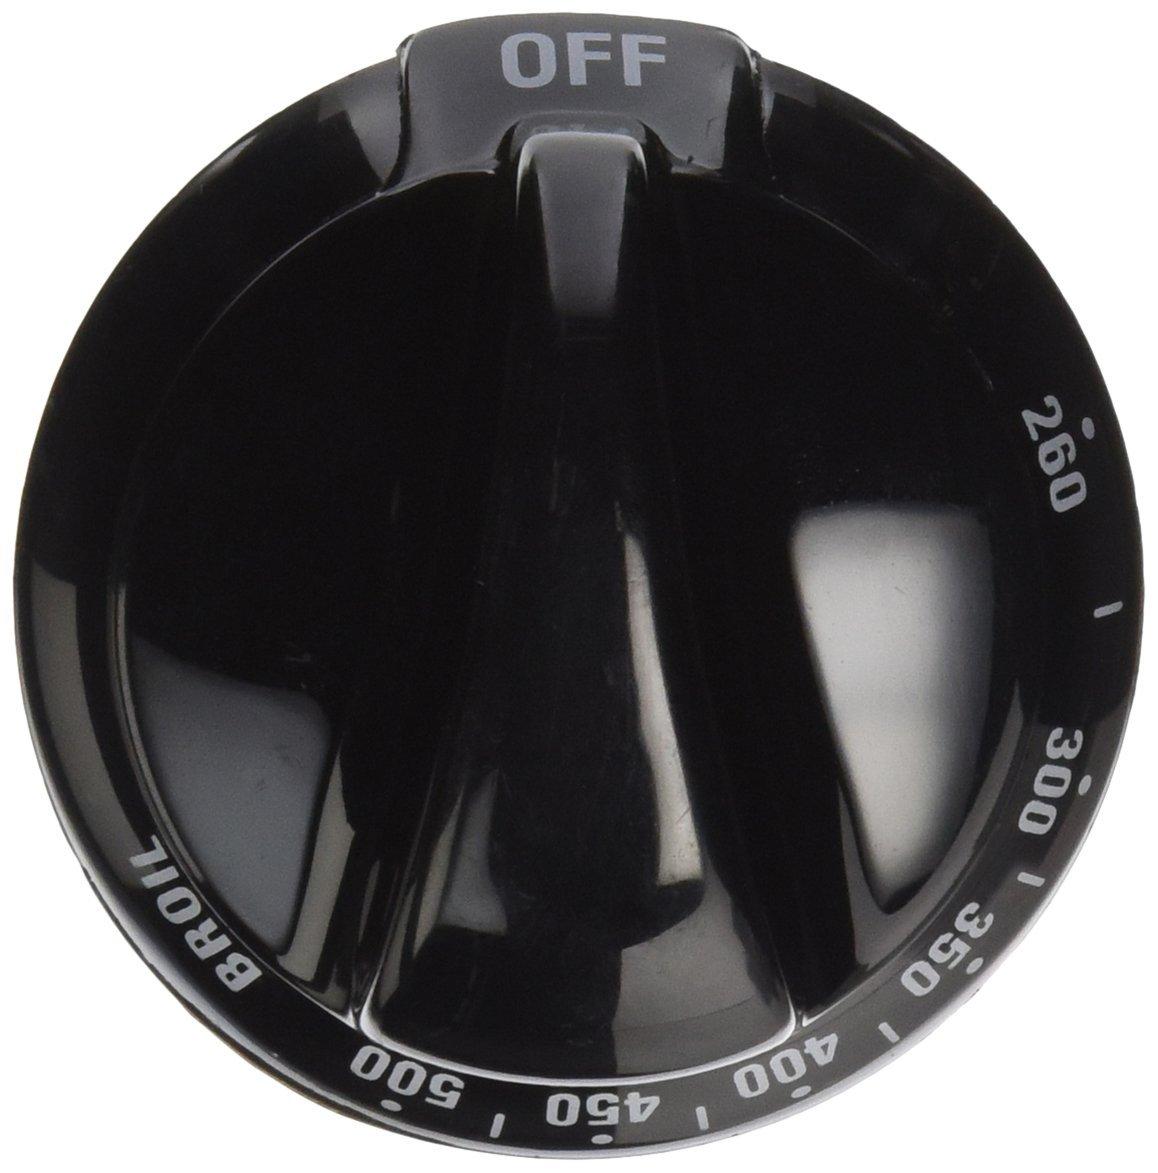 General Electric WB03K10159 Range/Stove/Oven Thermostat Knob